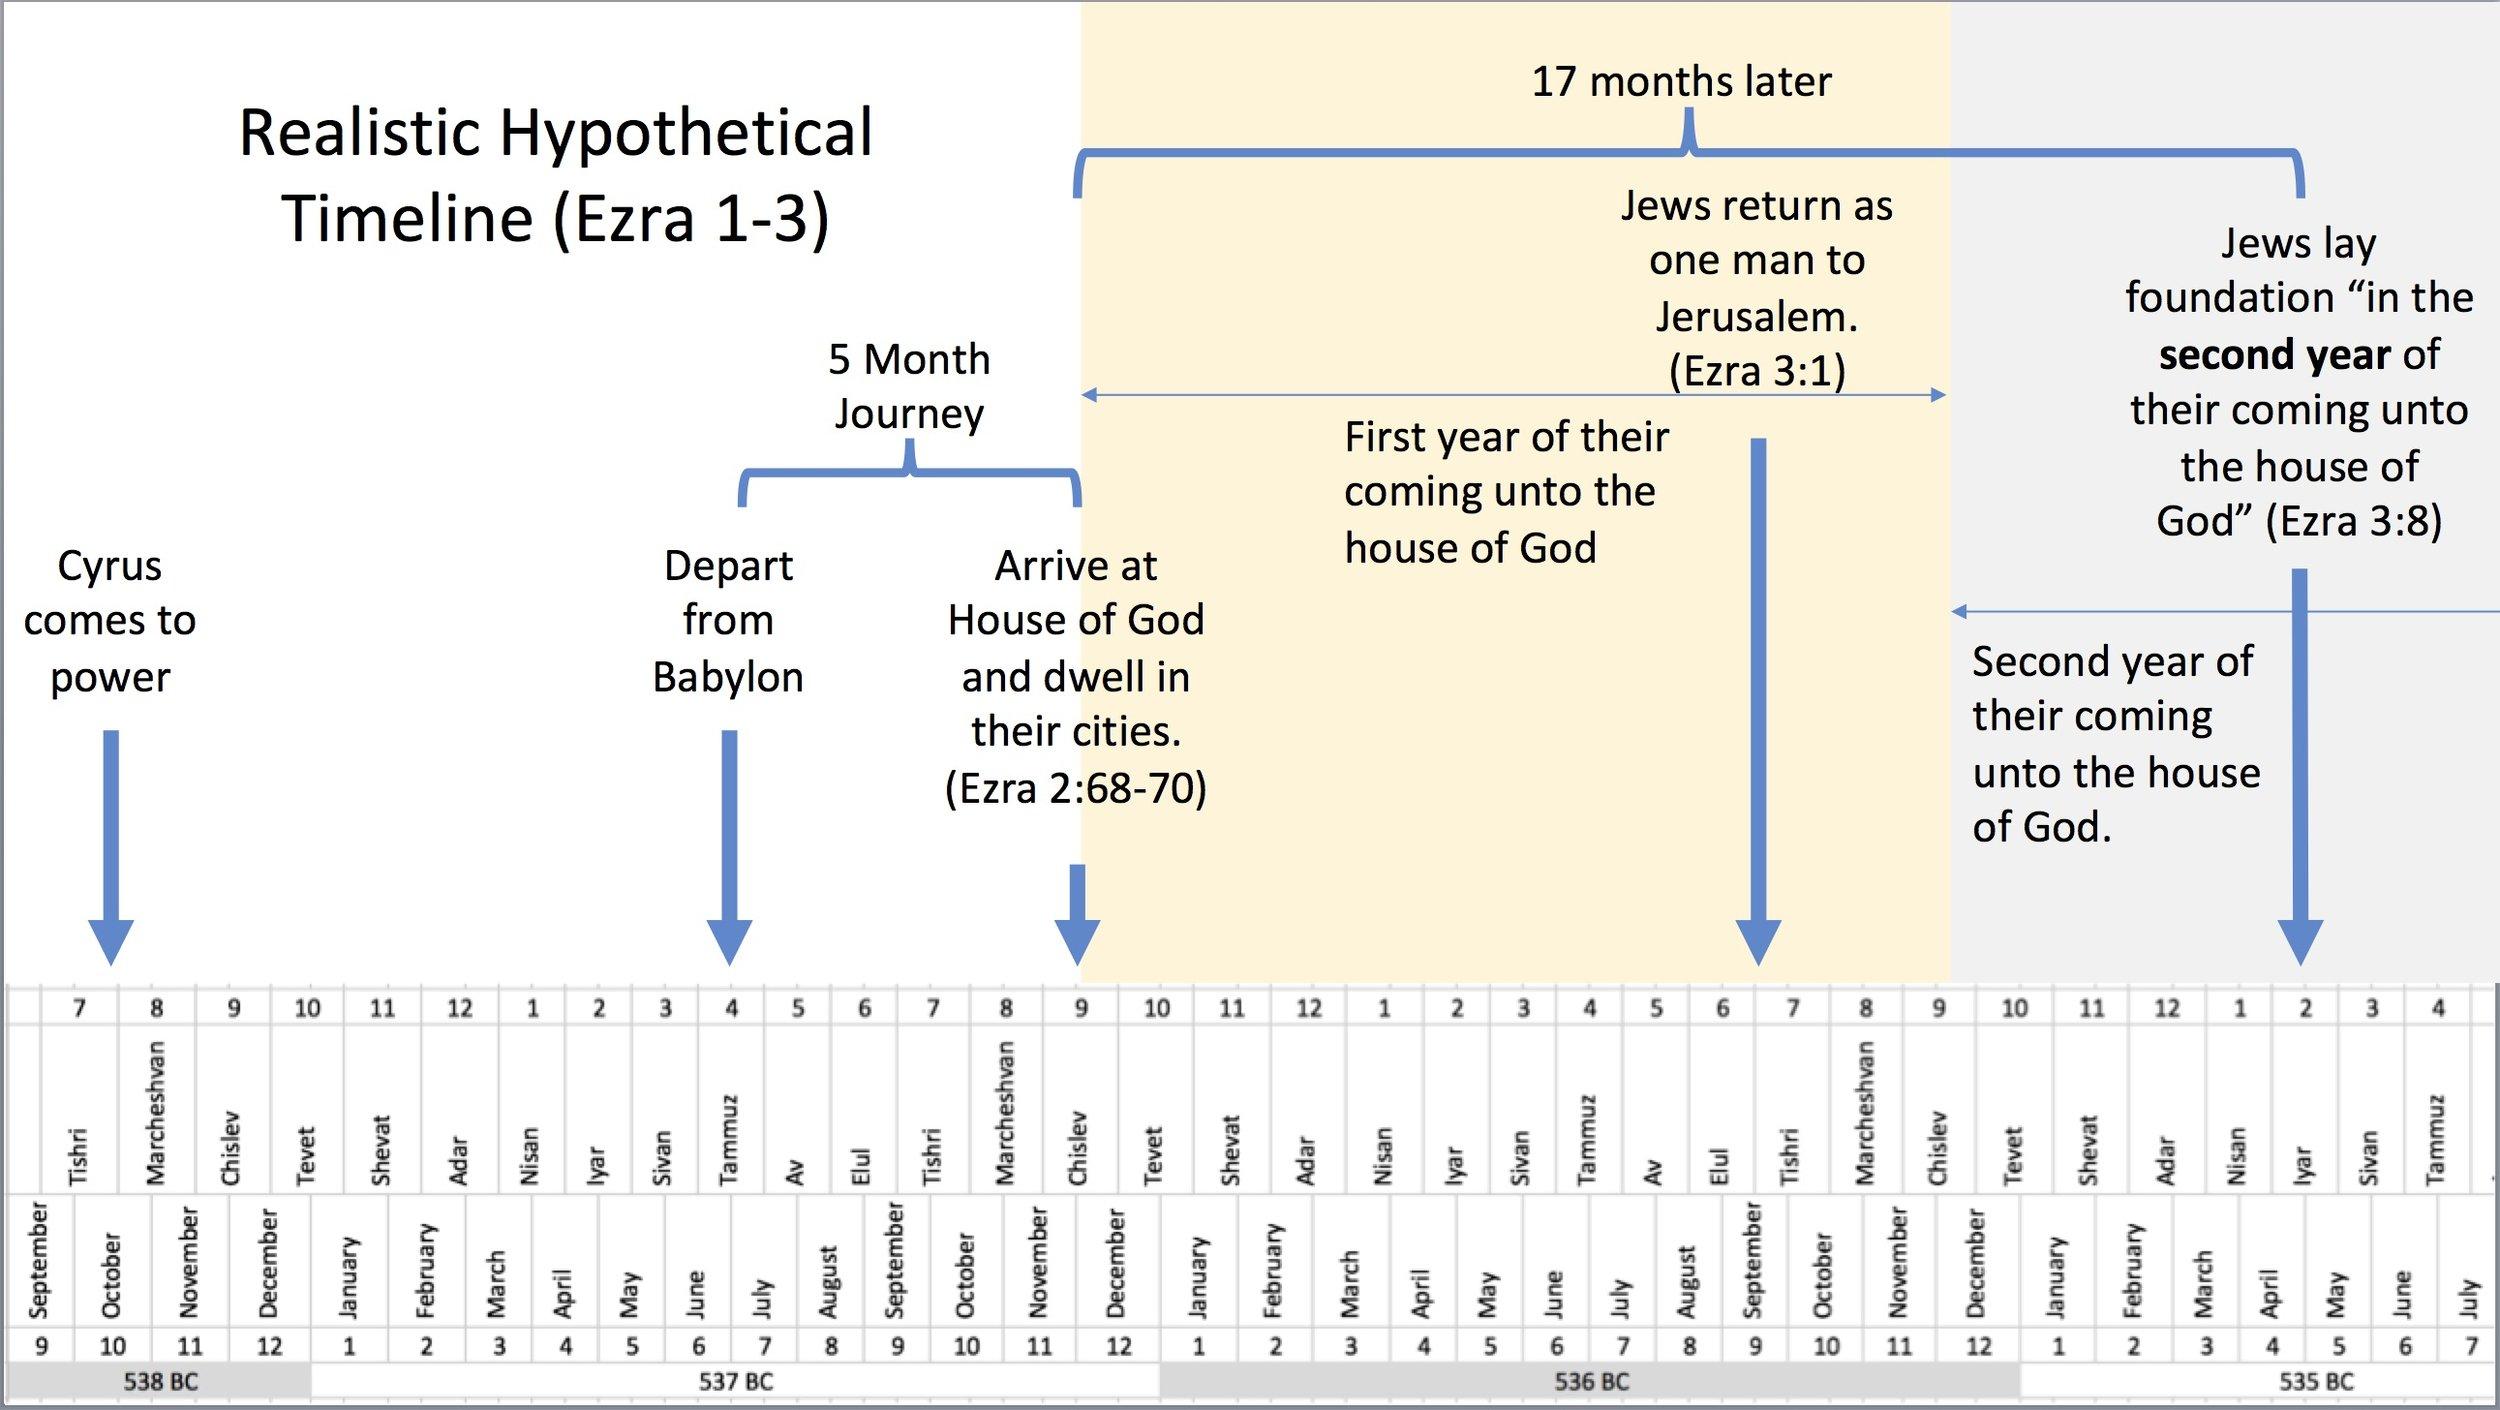 Realistic_Hypothetical_Timeline.jpg